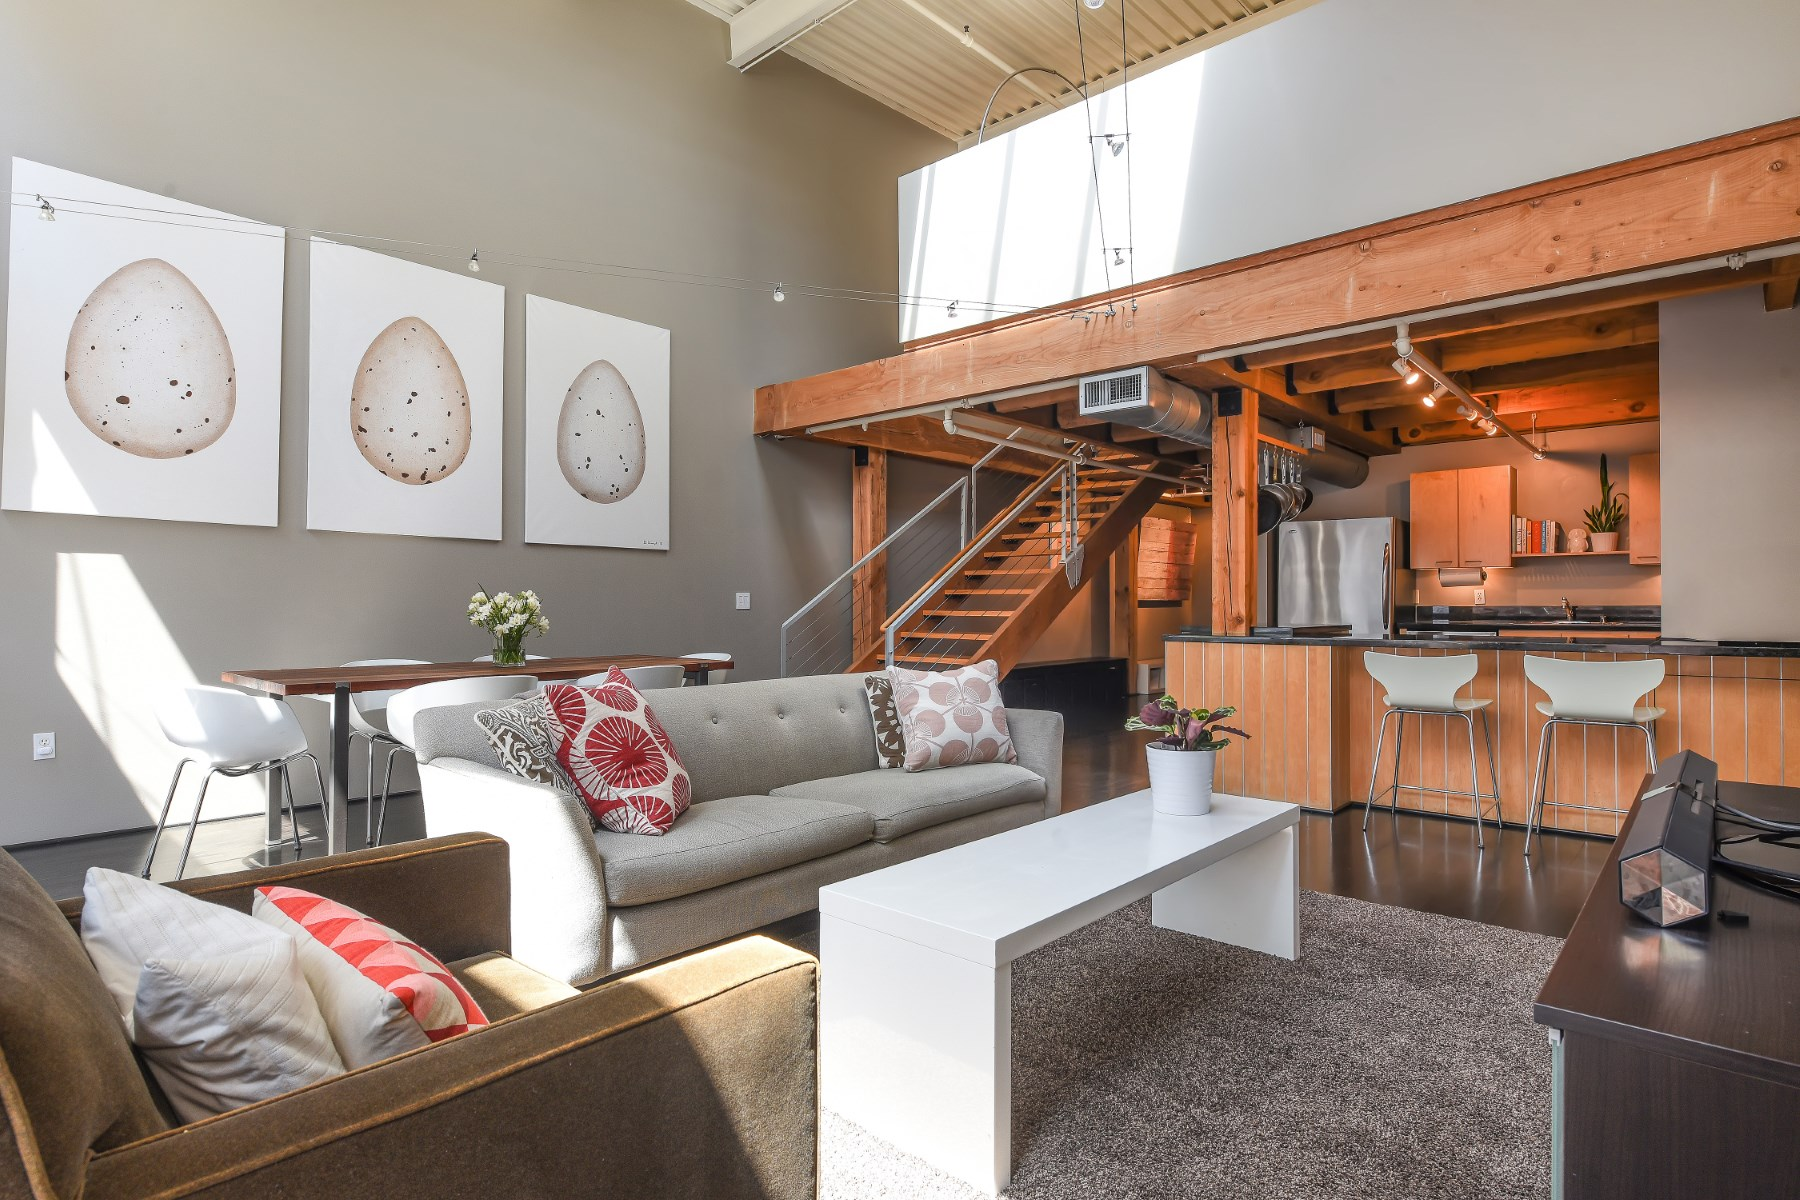 Condominium for Sale at Coveted Historic South Beach Loft 650 Delancey St Apt 409 South Beach, San Francisco, California, 94107 United States